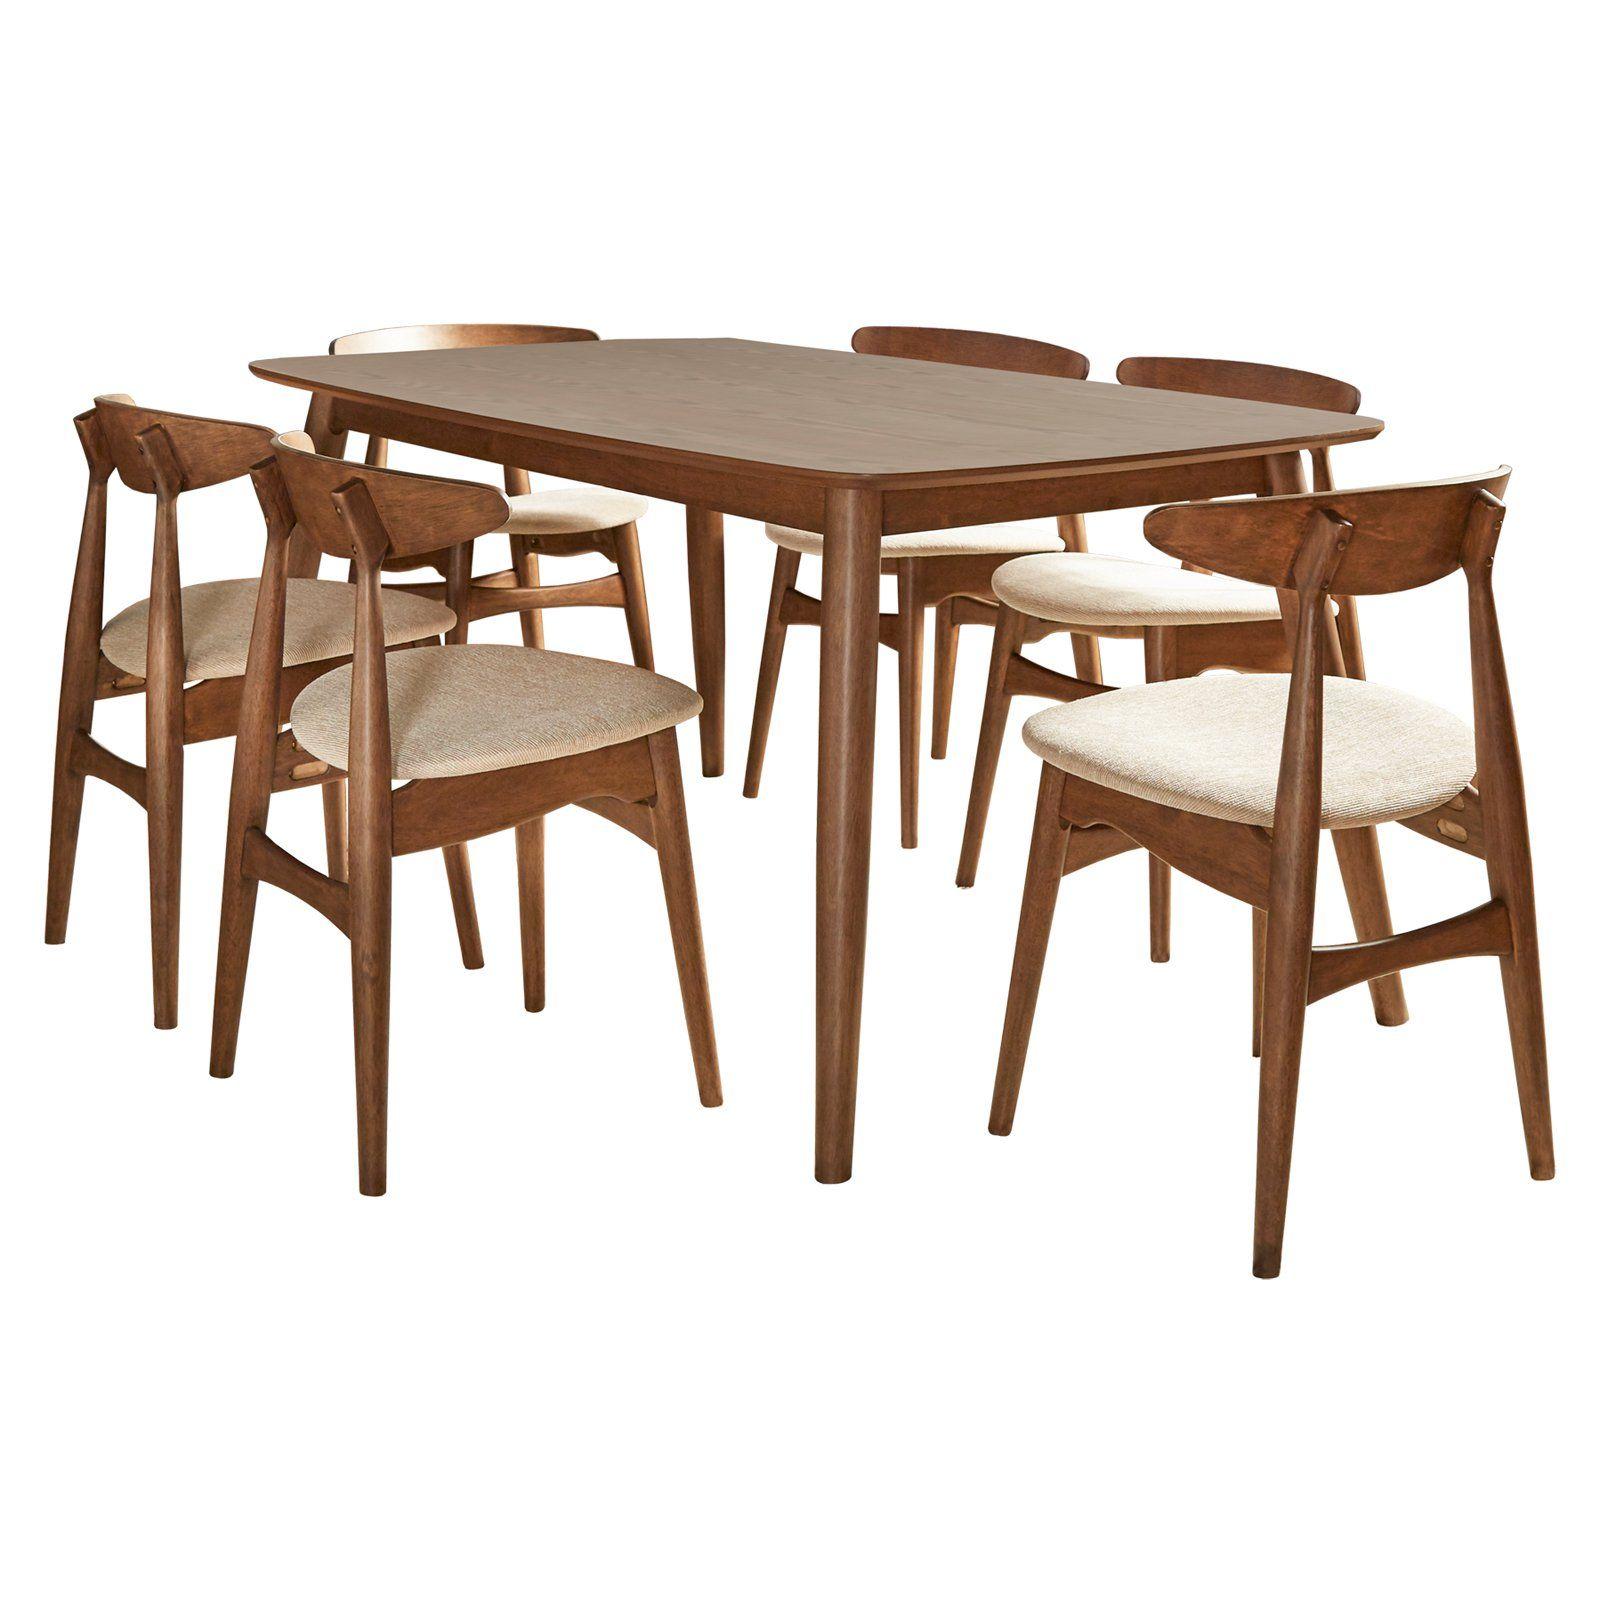 Chelsea Lane Mid Century Modern 7 Piece Dining Set Solid Wood